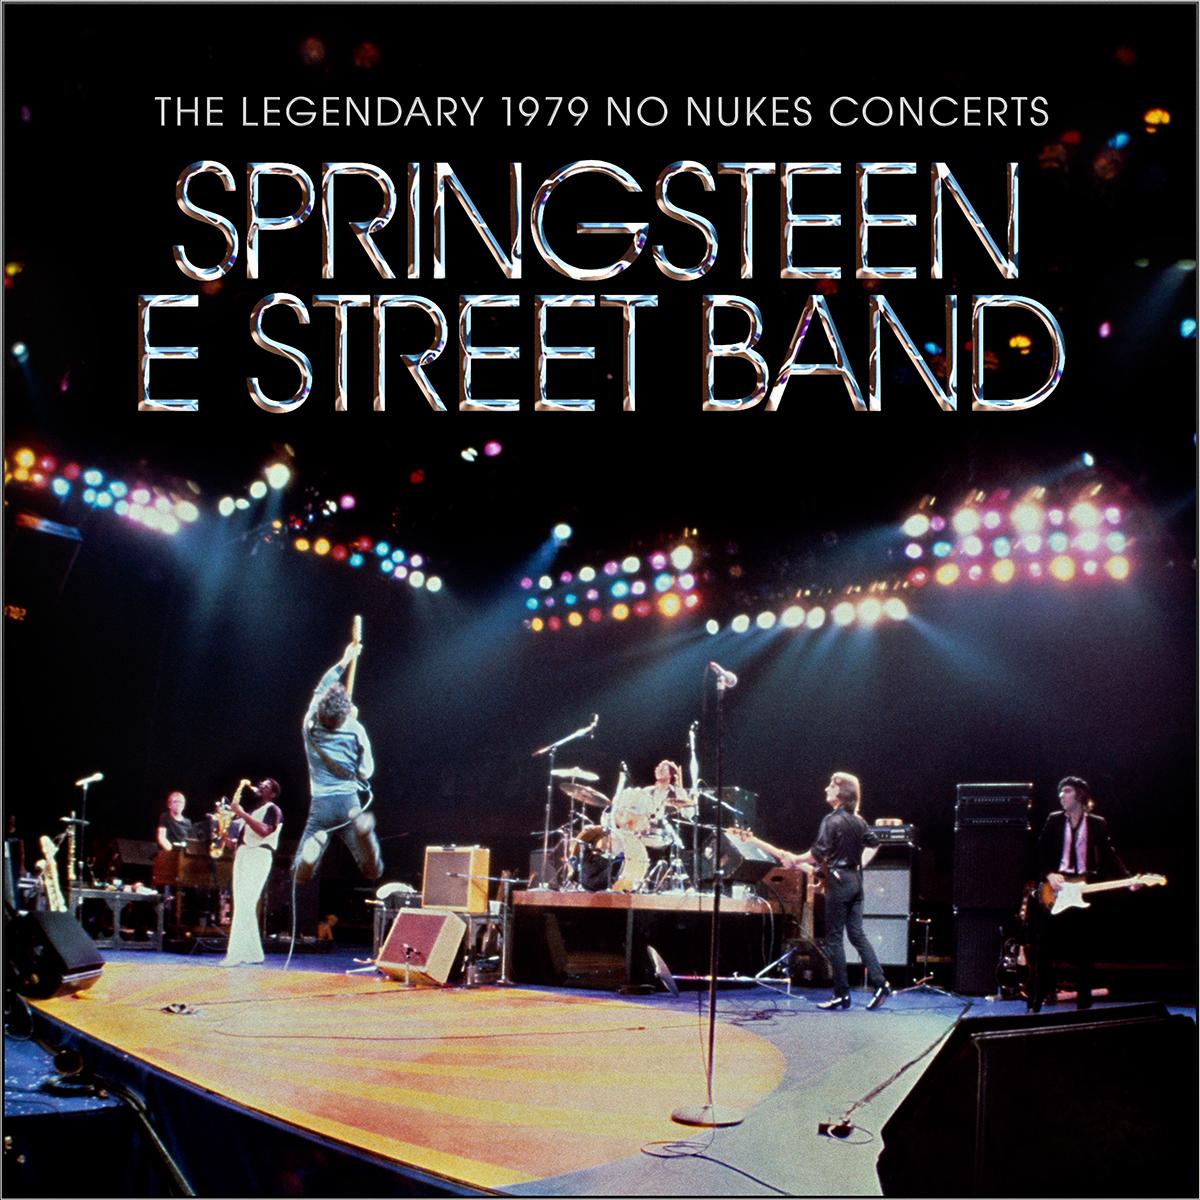 The Legendary 1979 No Nukes Concerts